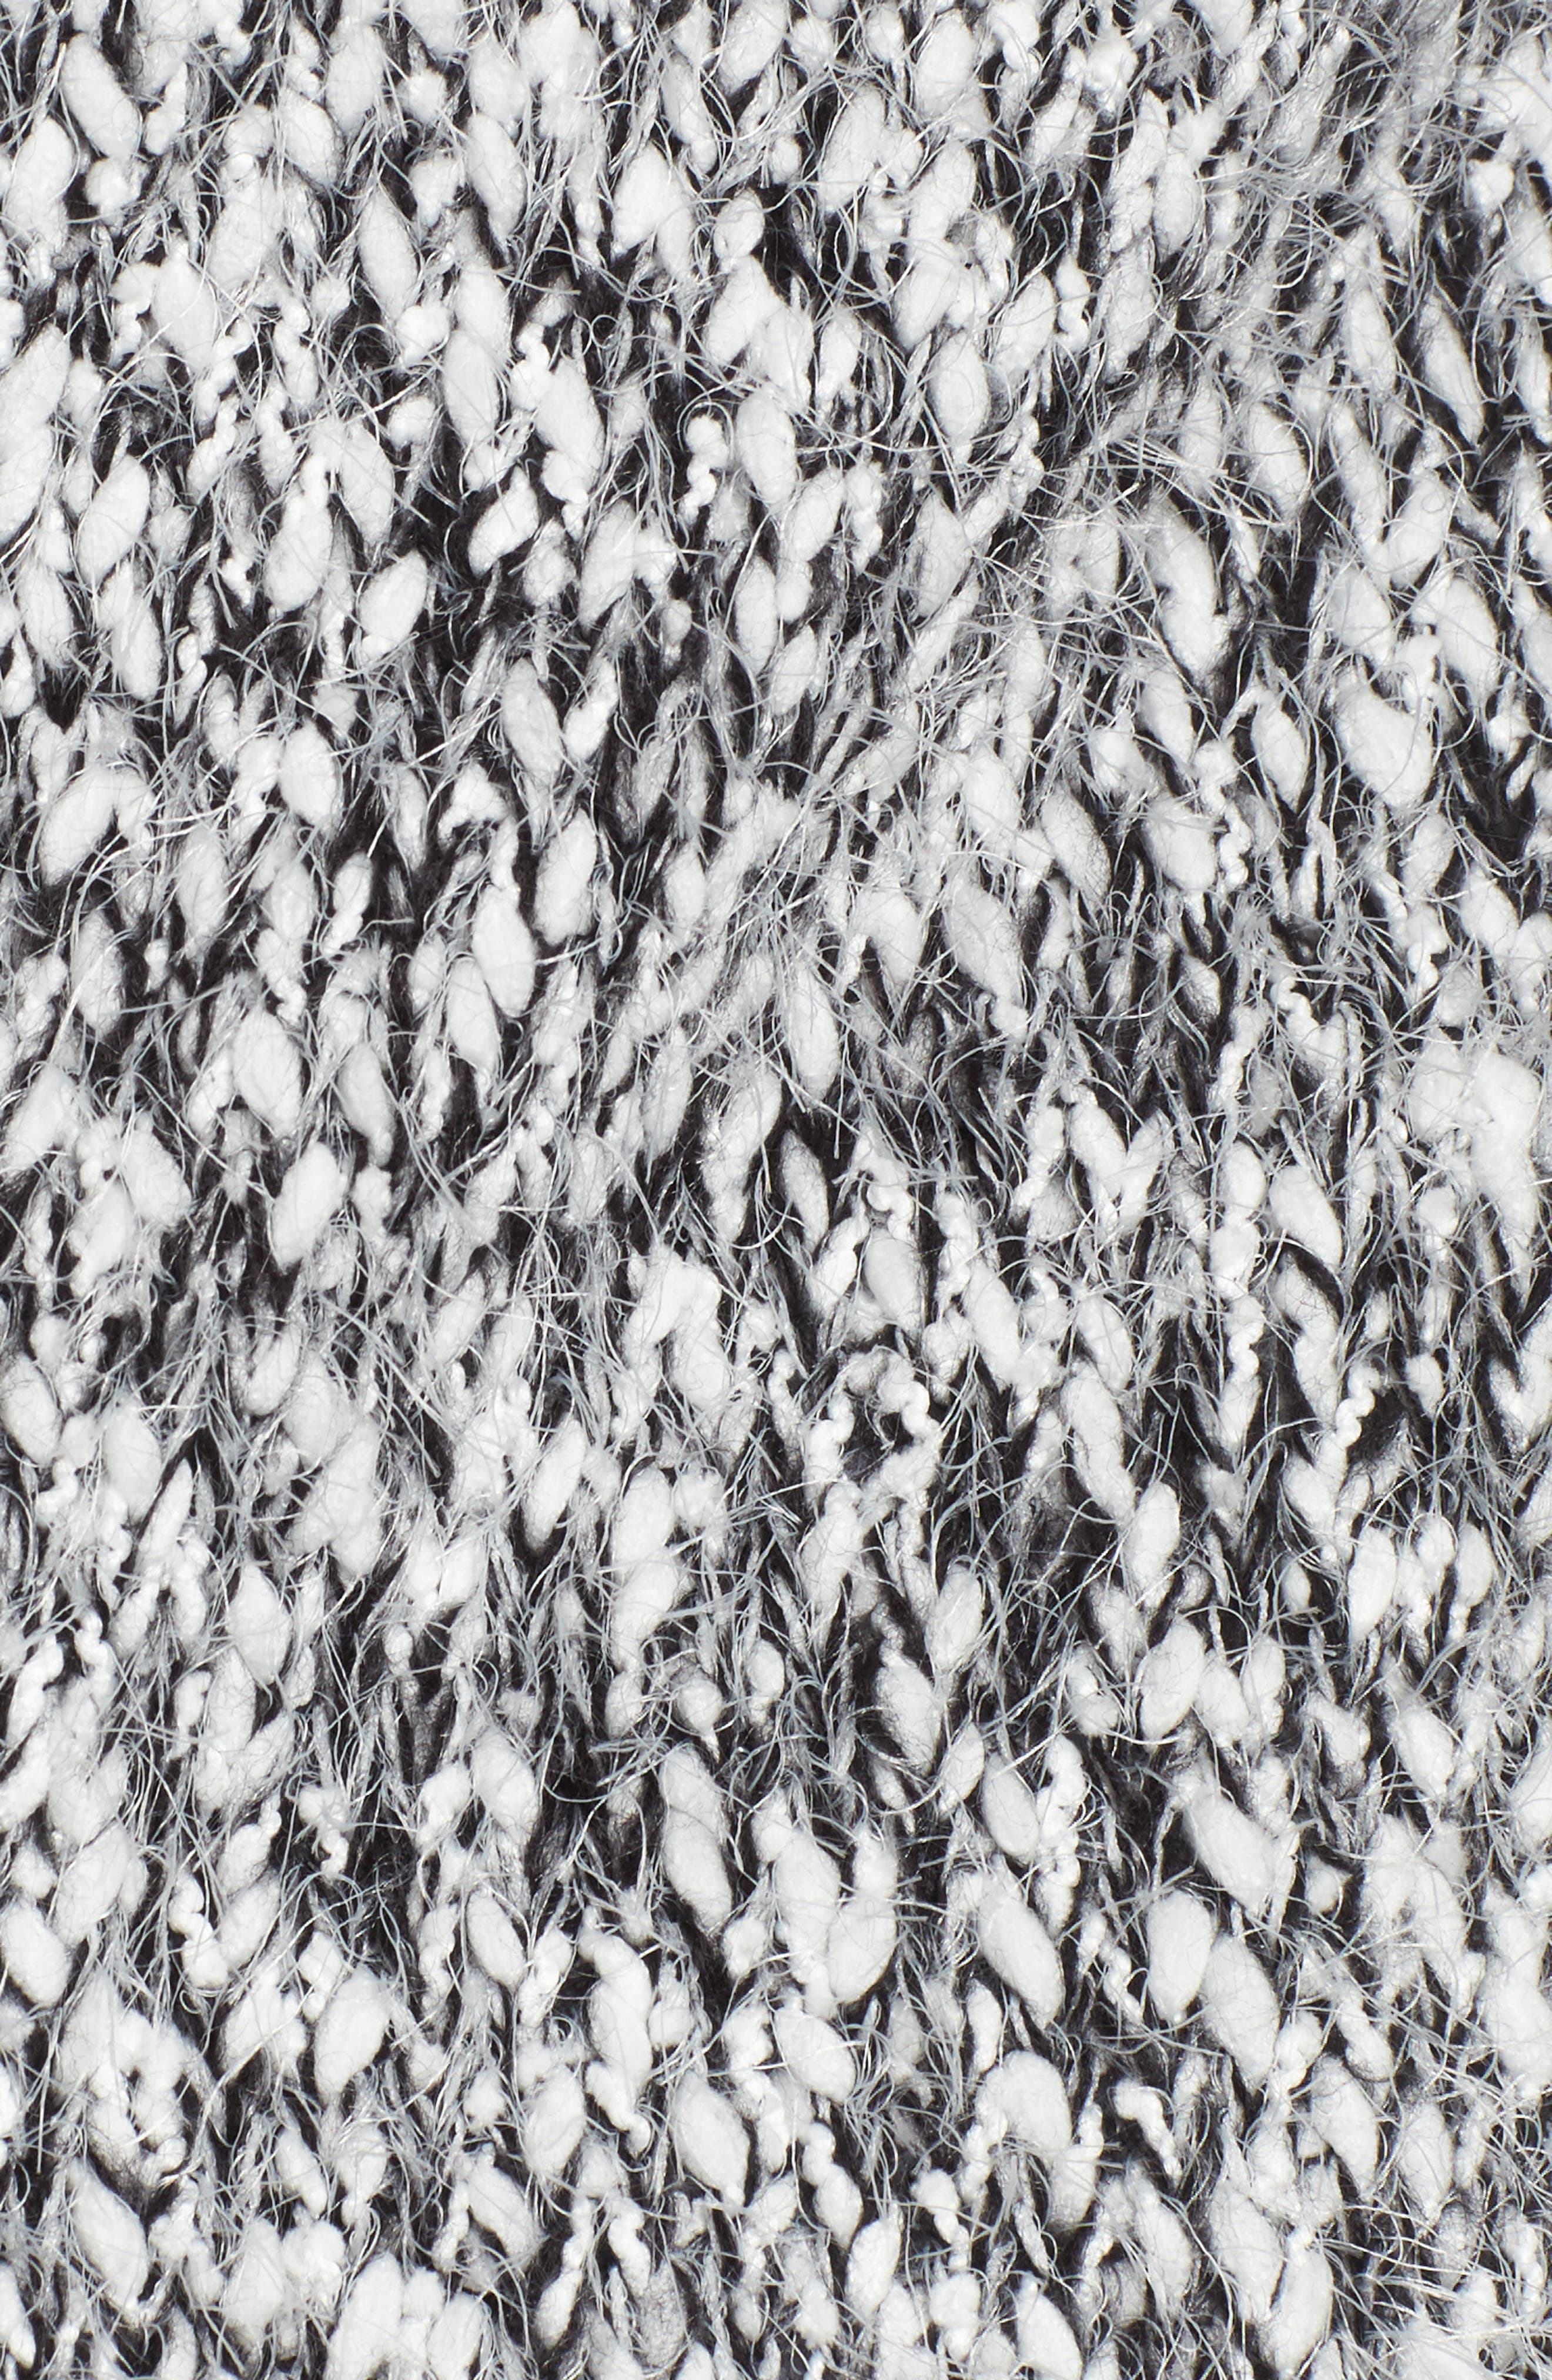 Eyelash Hooded Cardigan,                             Alternate thumbnail 5, color,                             Black/ White